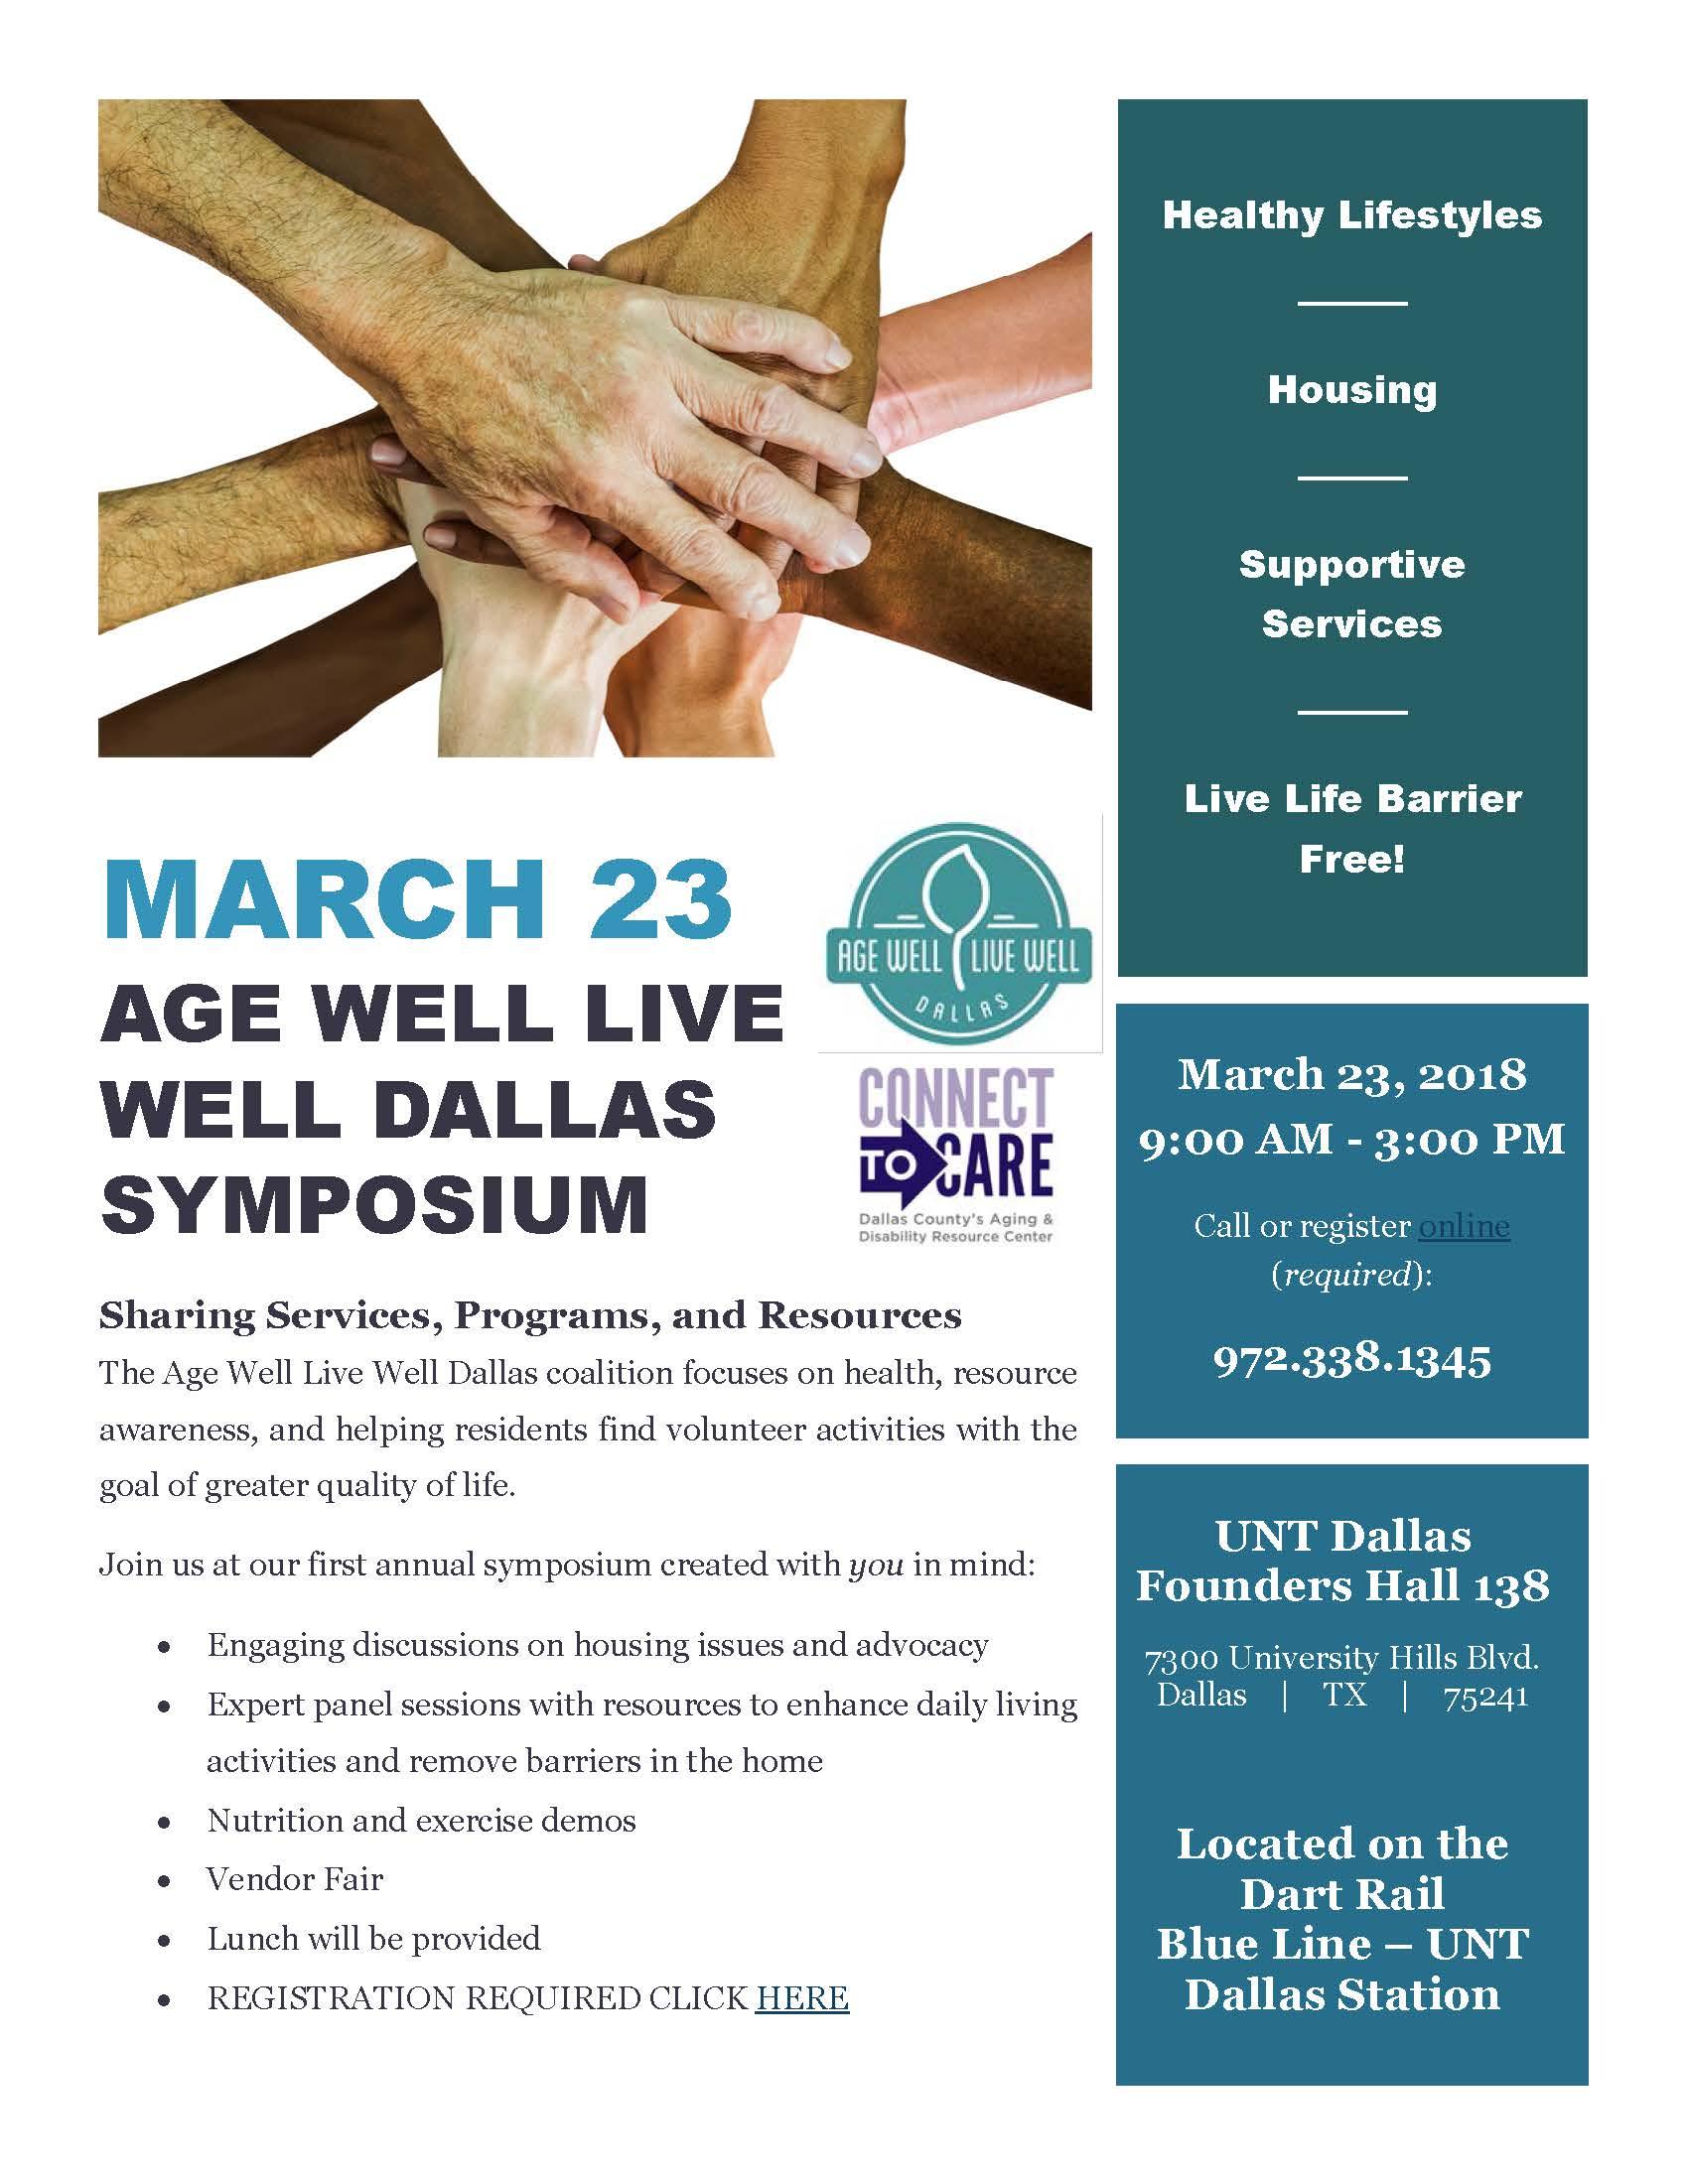 AWLWDallas_2018_Symposium